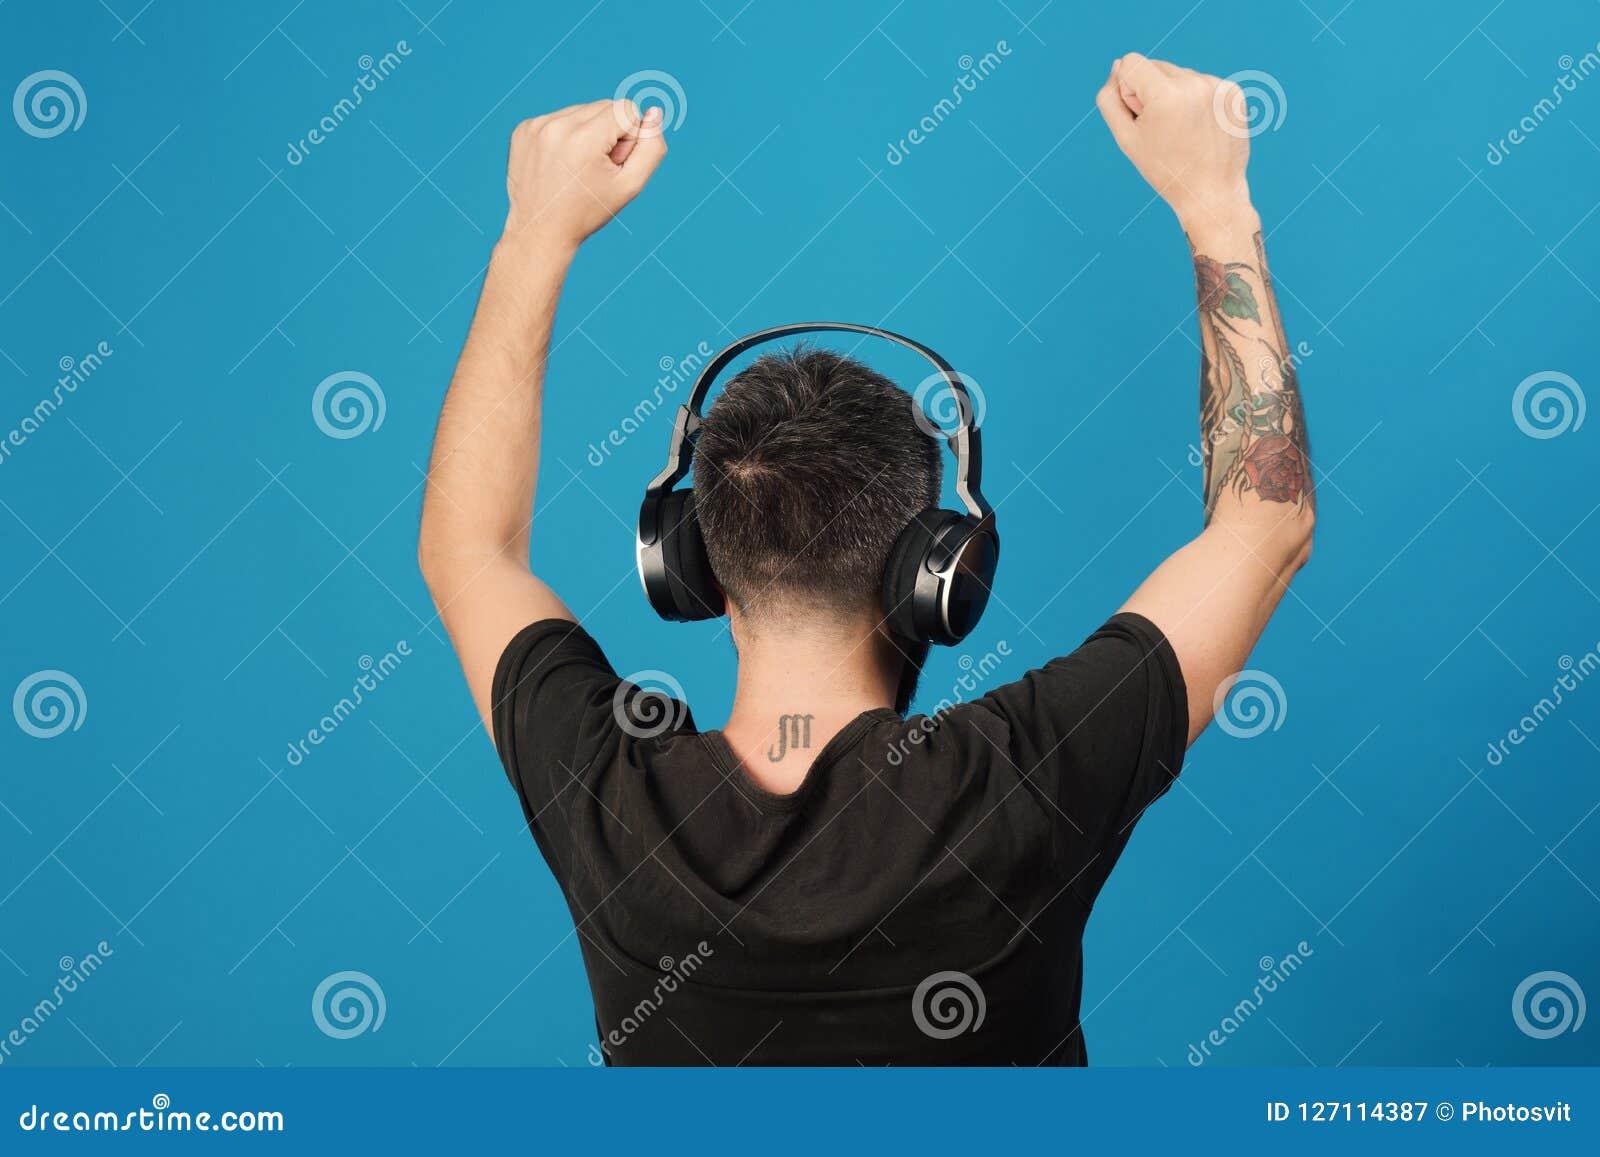 Technologies and music concept. Dj with scorpio tattoo wears headphones